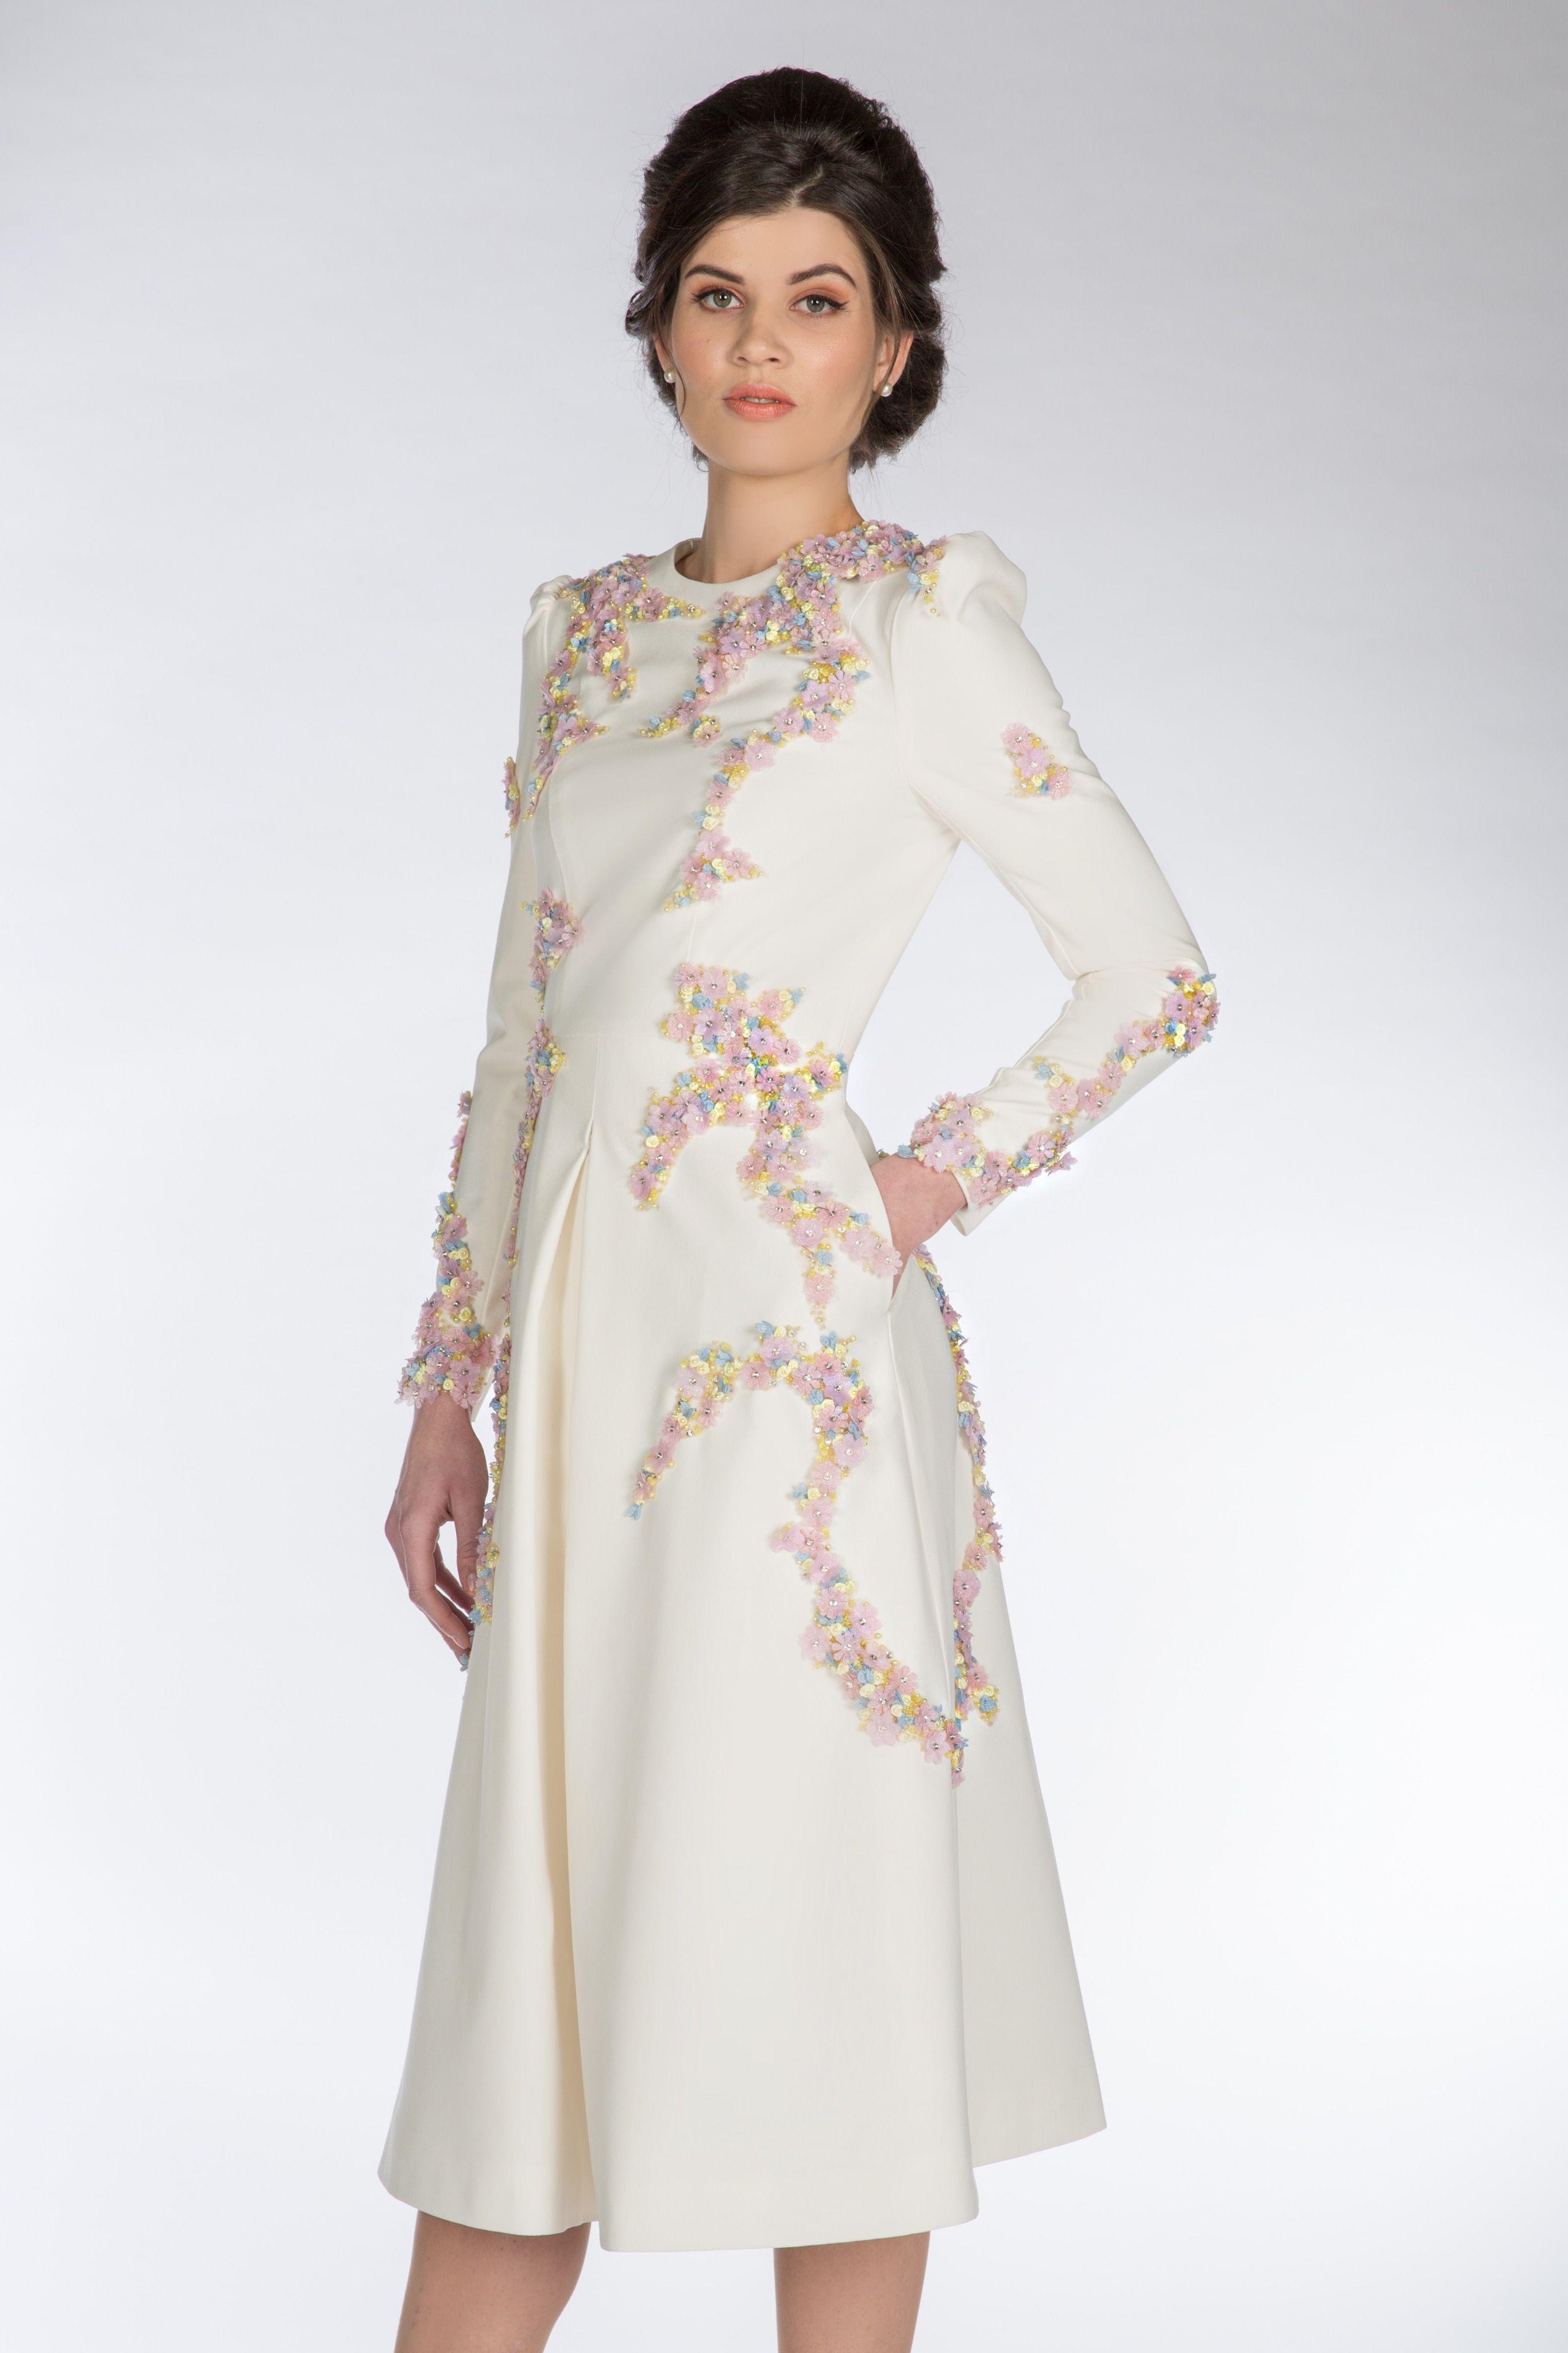 54f7e08eca7a CLAIRE MISCHEVANI Ivory Crepe Jardin Dress | Ivory Crepe Jardin ...